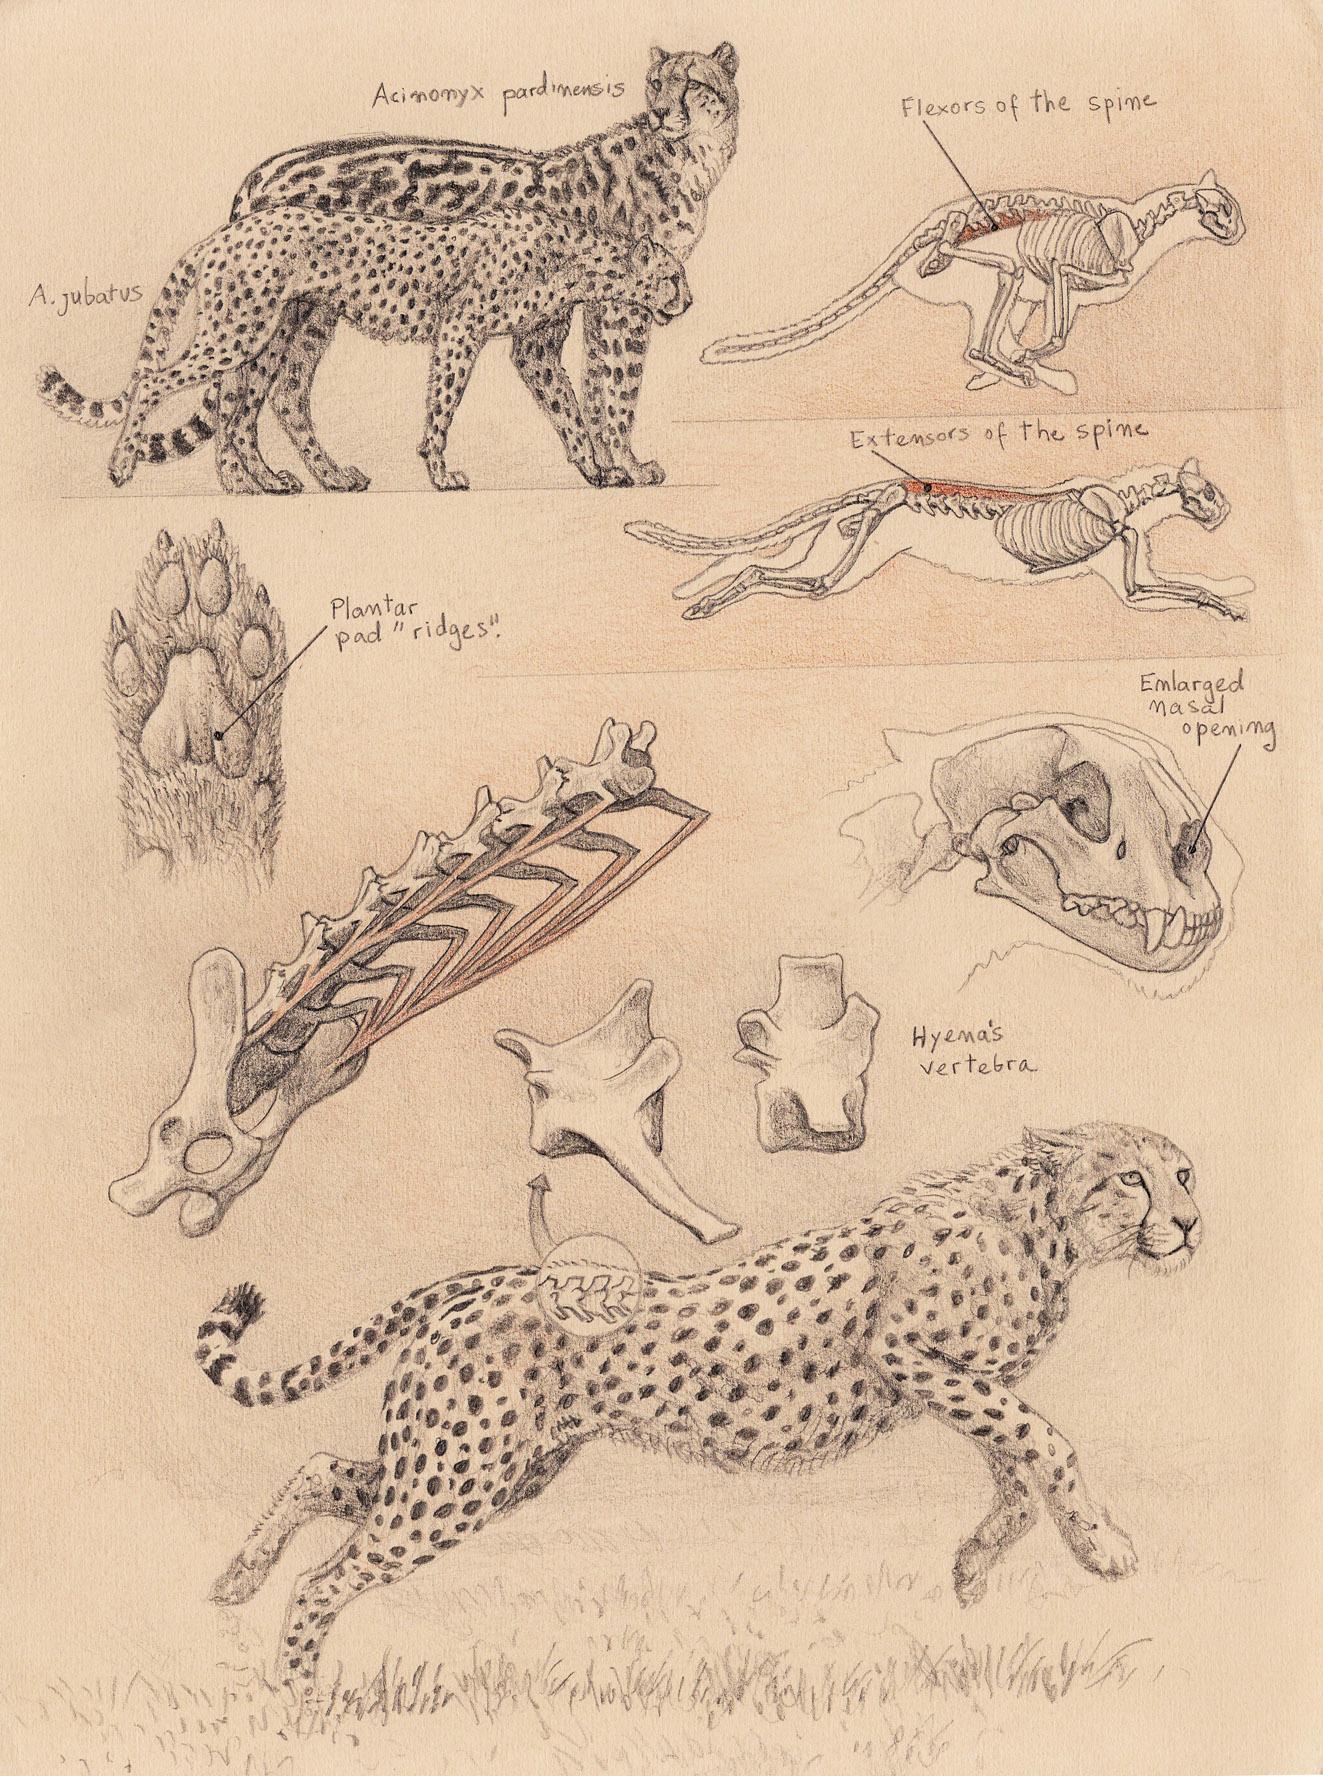 Drawn hunting cheetah Diaries Best old Sabertooth 1: